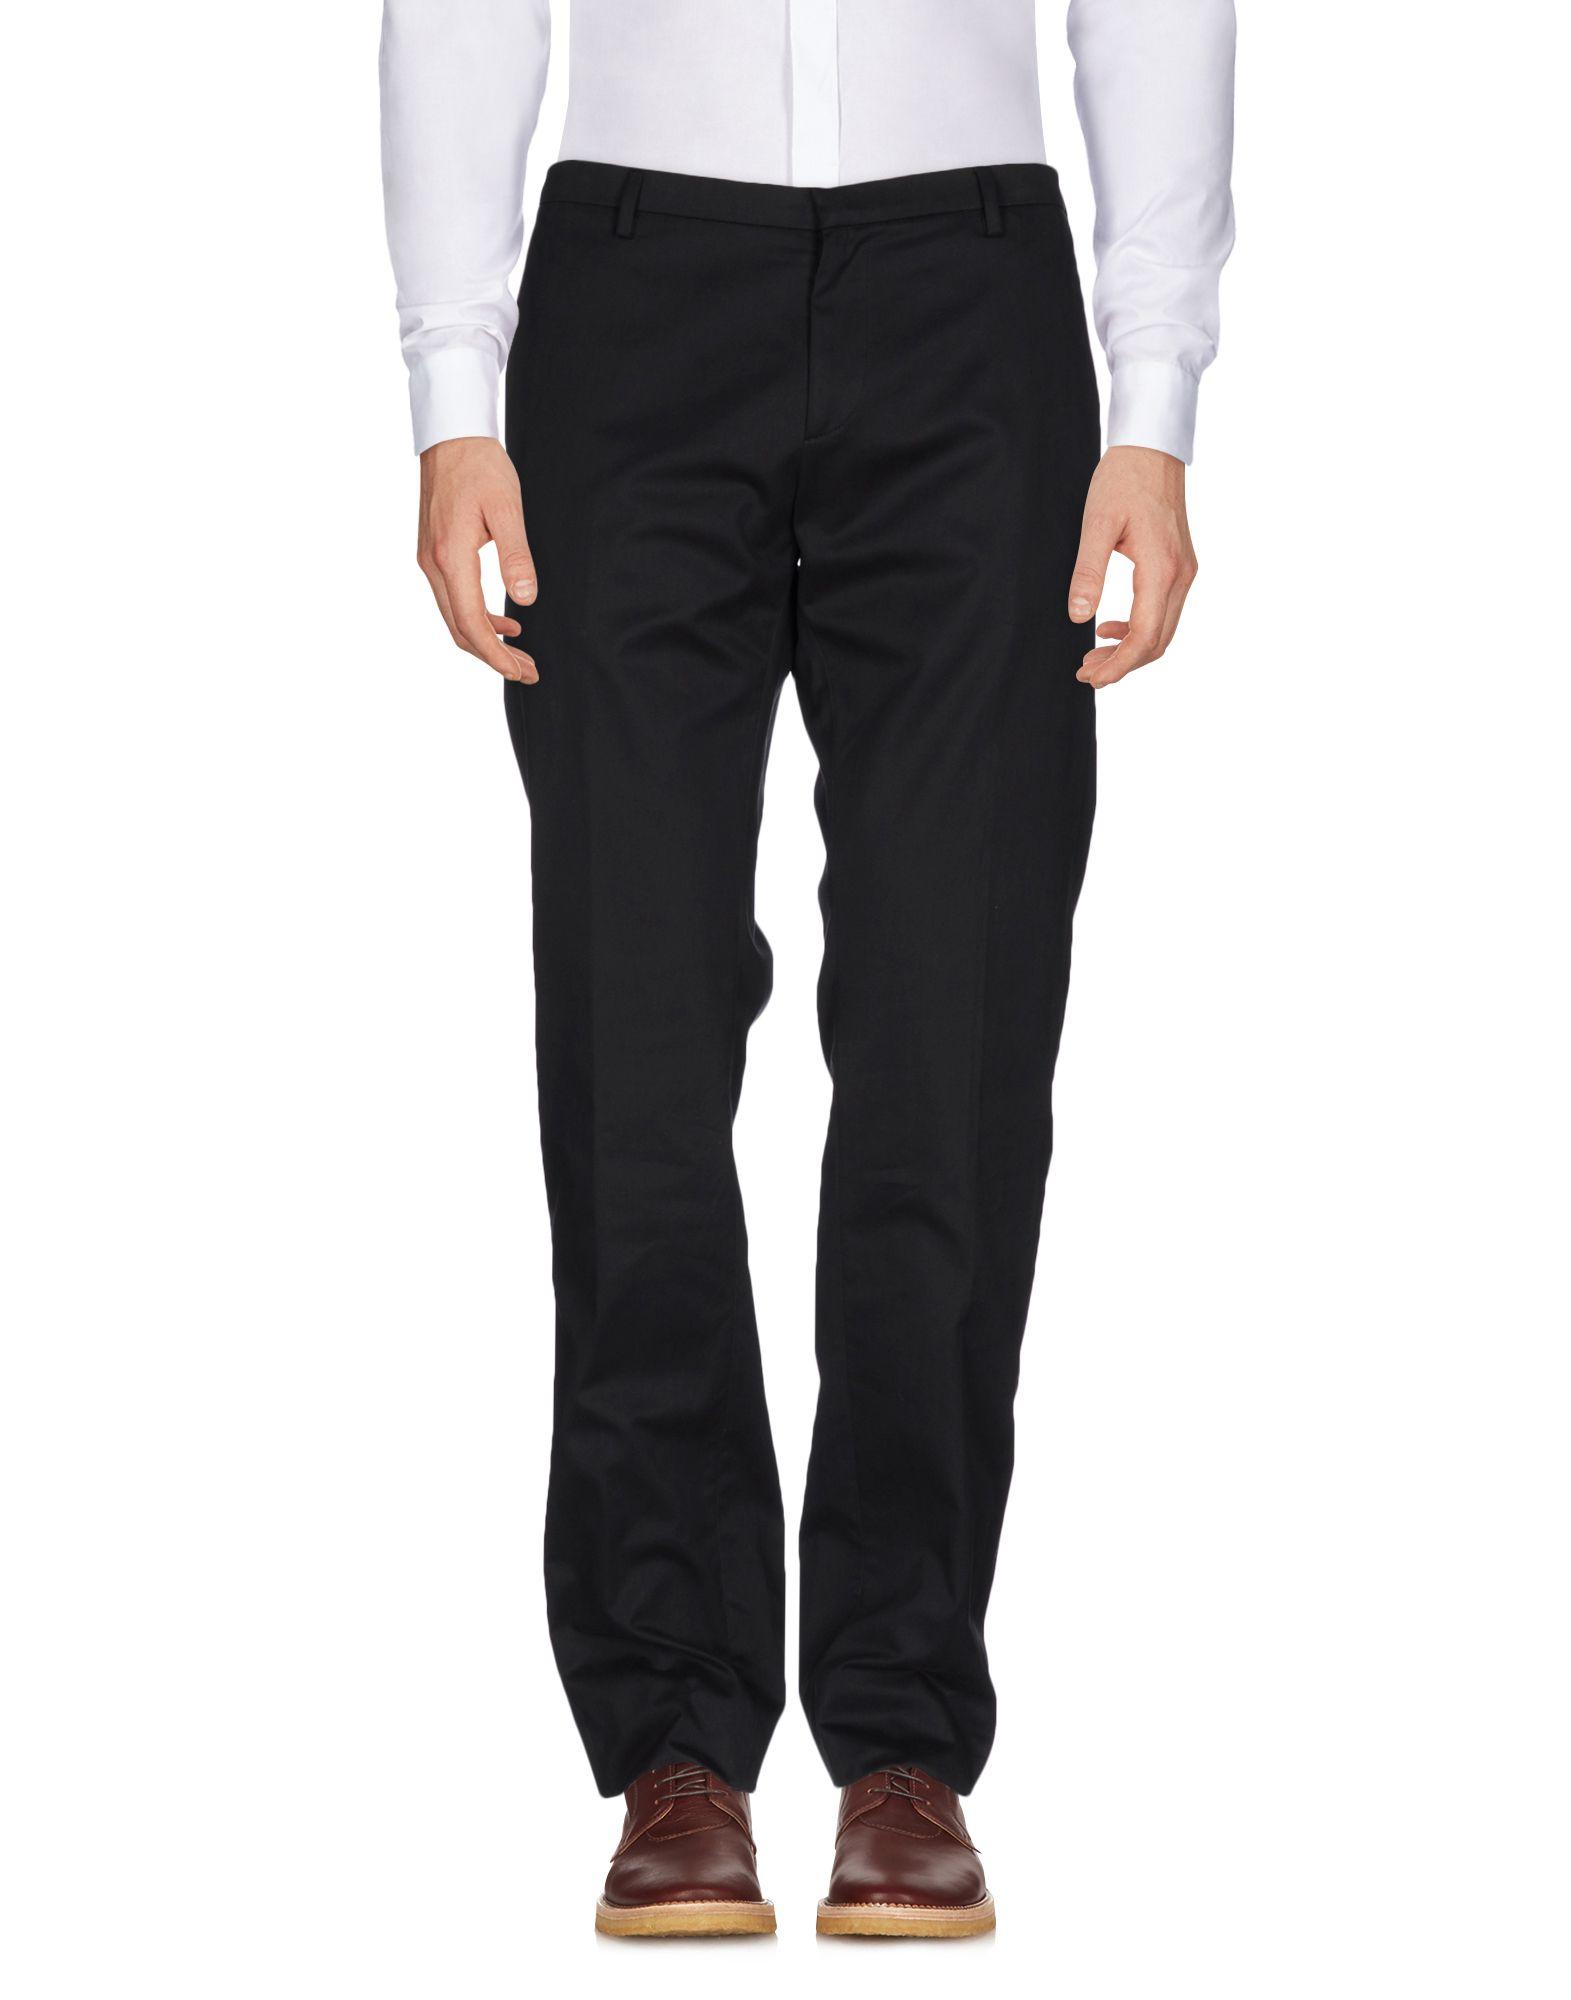 Pantalone Ring Uomo - Acquista online su